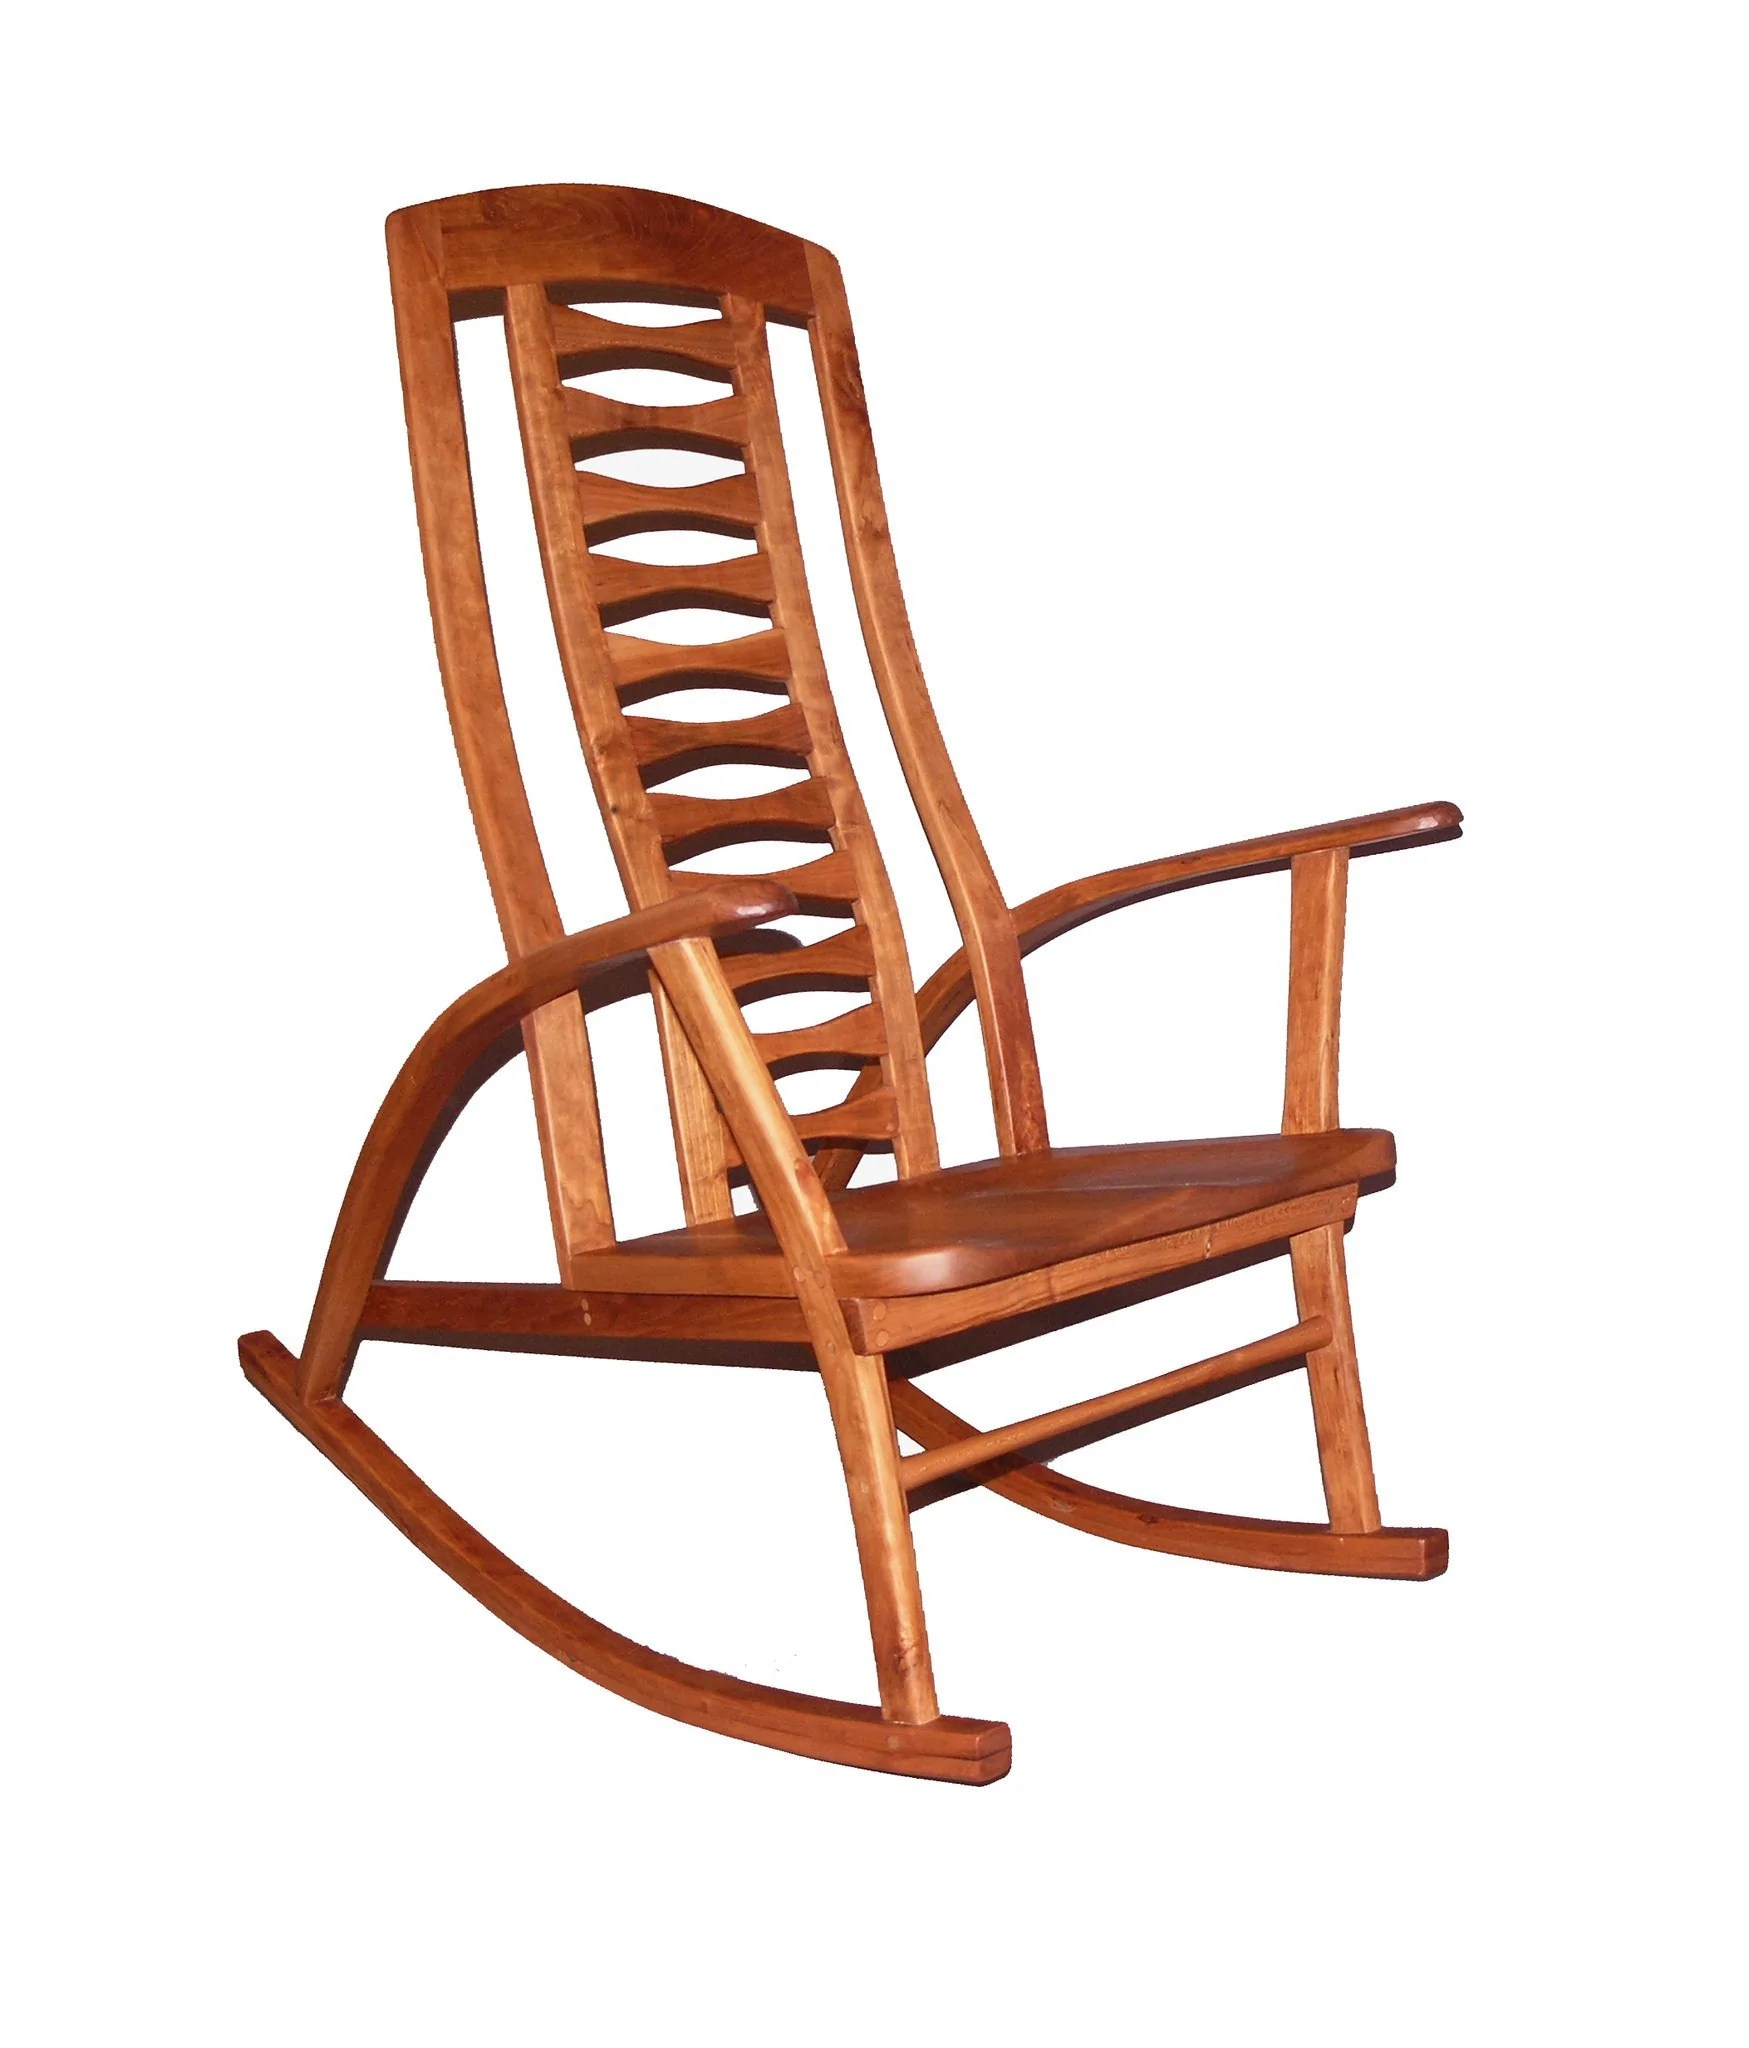 handmade rocking chairs chair covers buy knitting custom solid wood